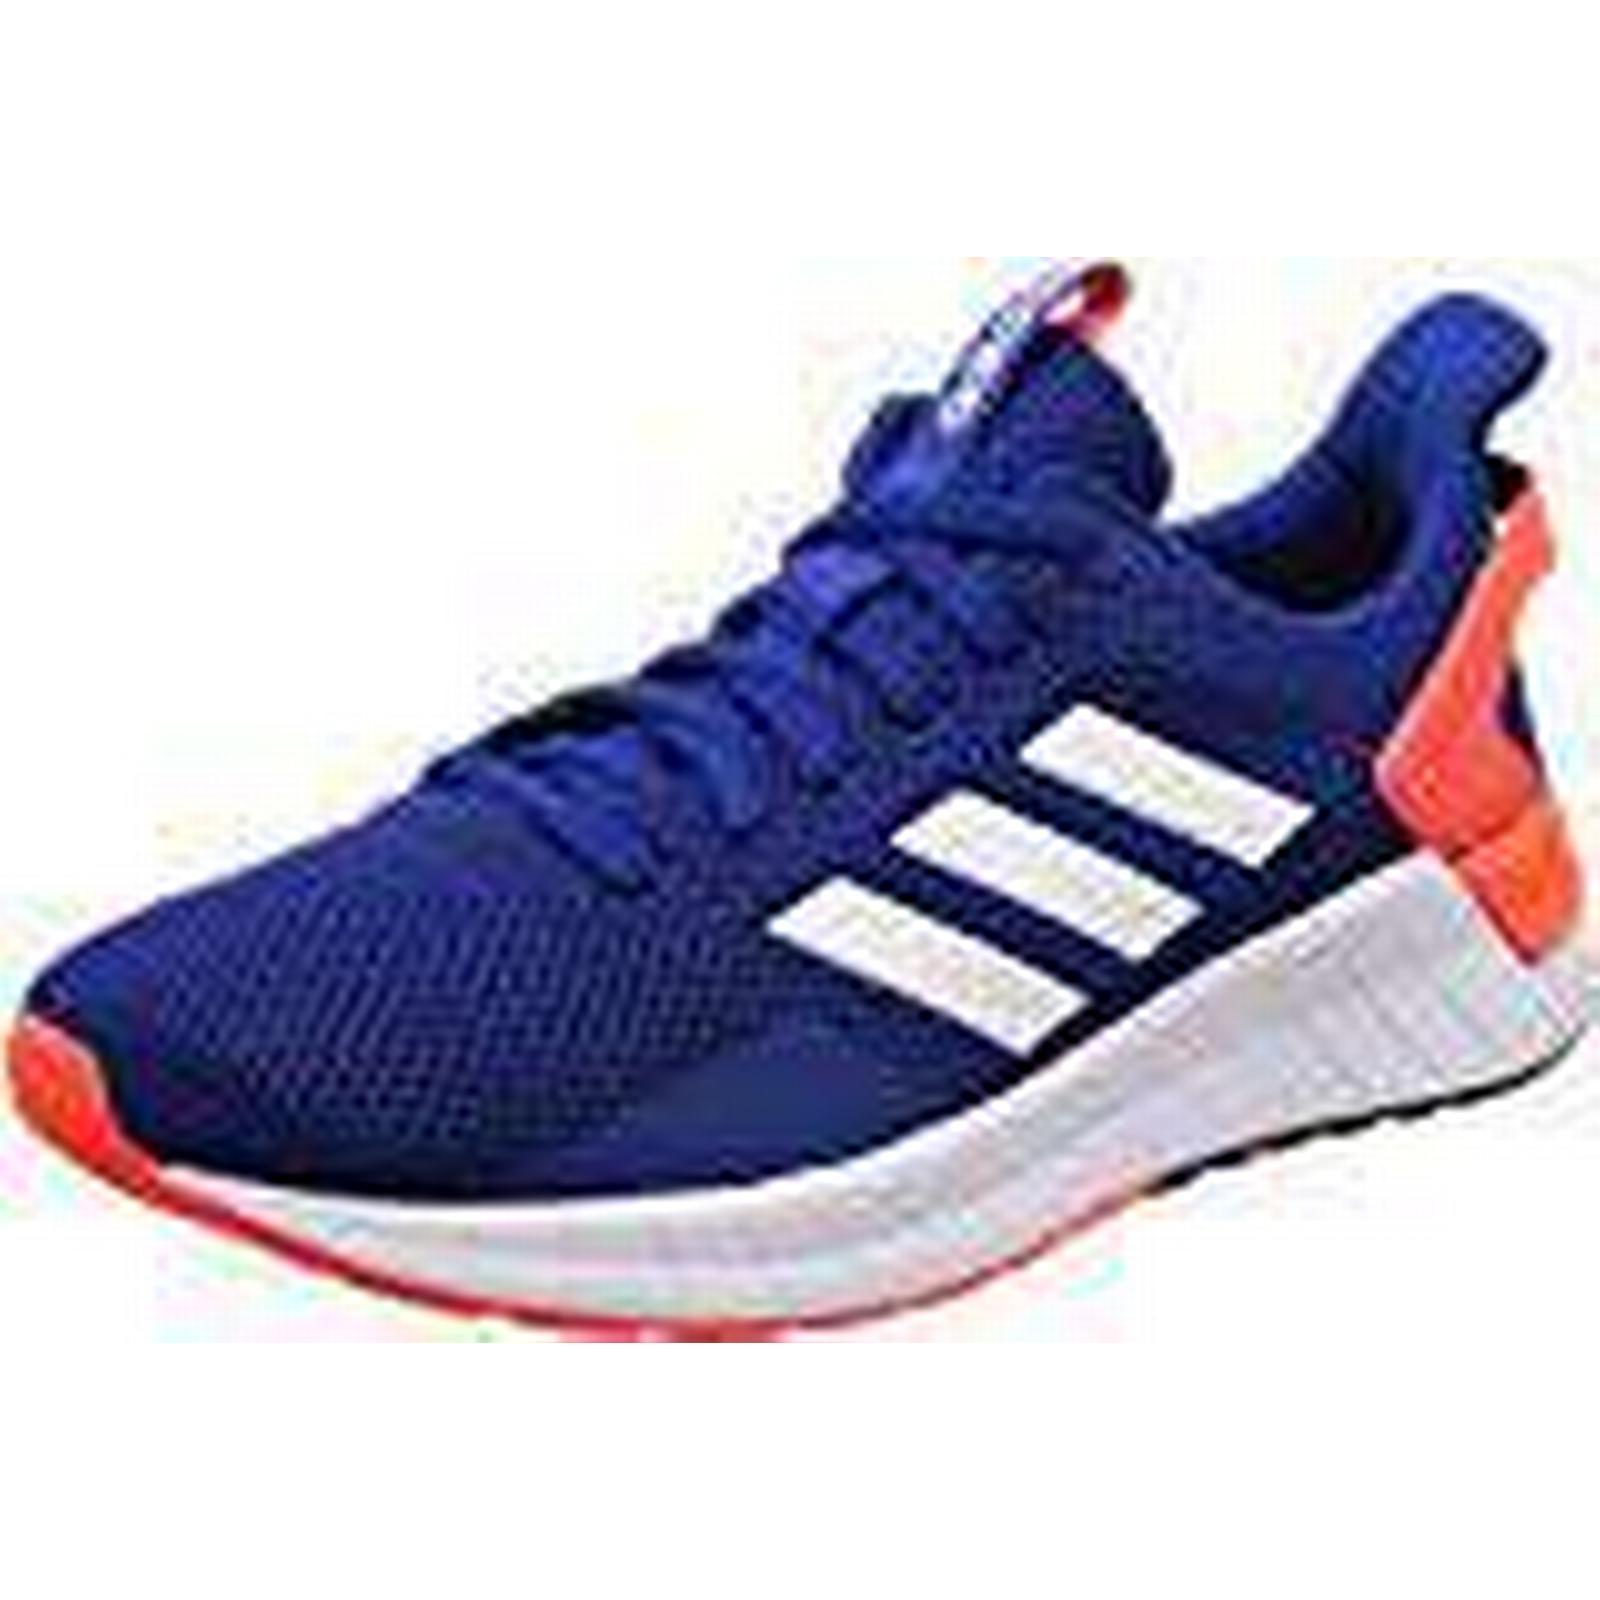 Adidas Men's Questar Ride Gymnastics Shoes, Multicolor (Collegiate Royal/FTWR White/Collegiate Navy), Navy Collegiate Royal/FTWR White/Collegiate Navy), White/Collegiate 8.5 UK 859141